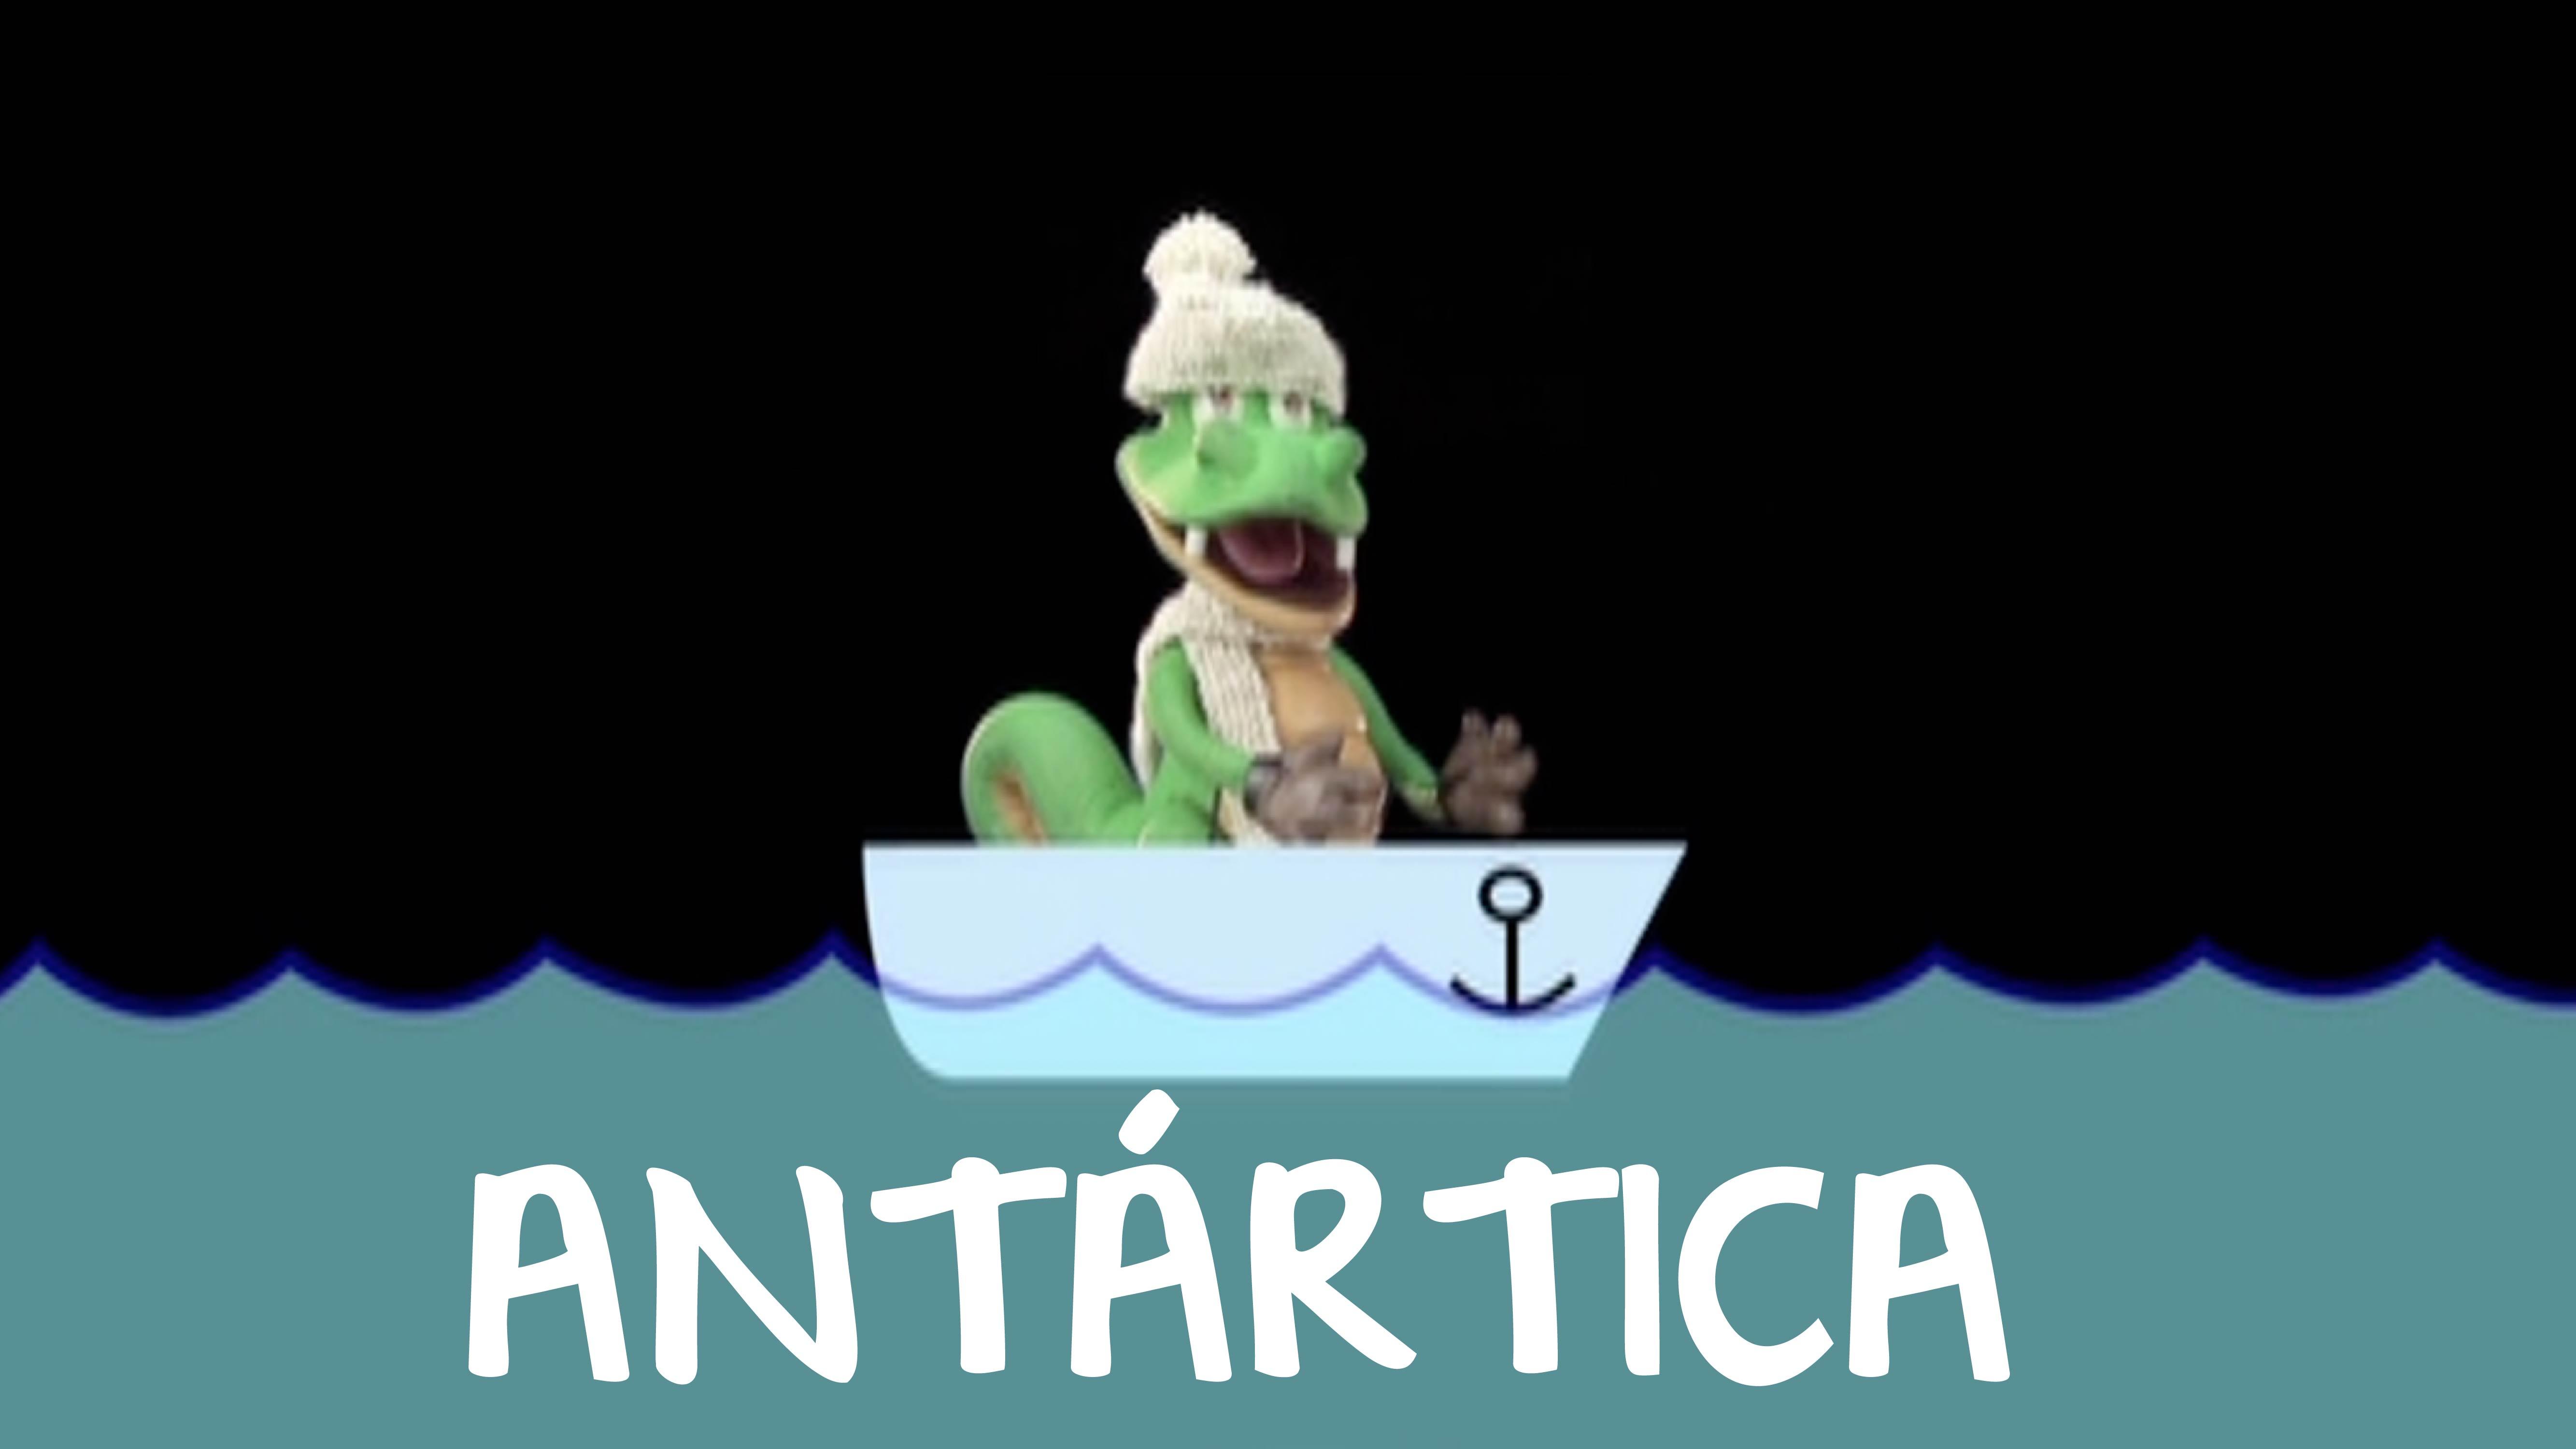 bbm_capa_youtube_antartica-01